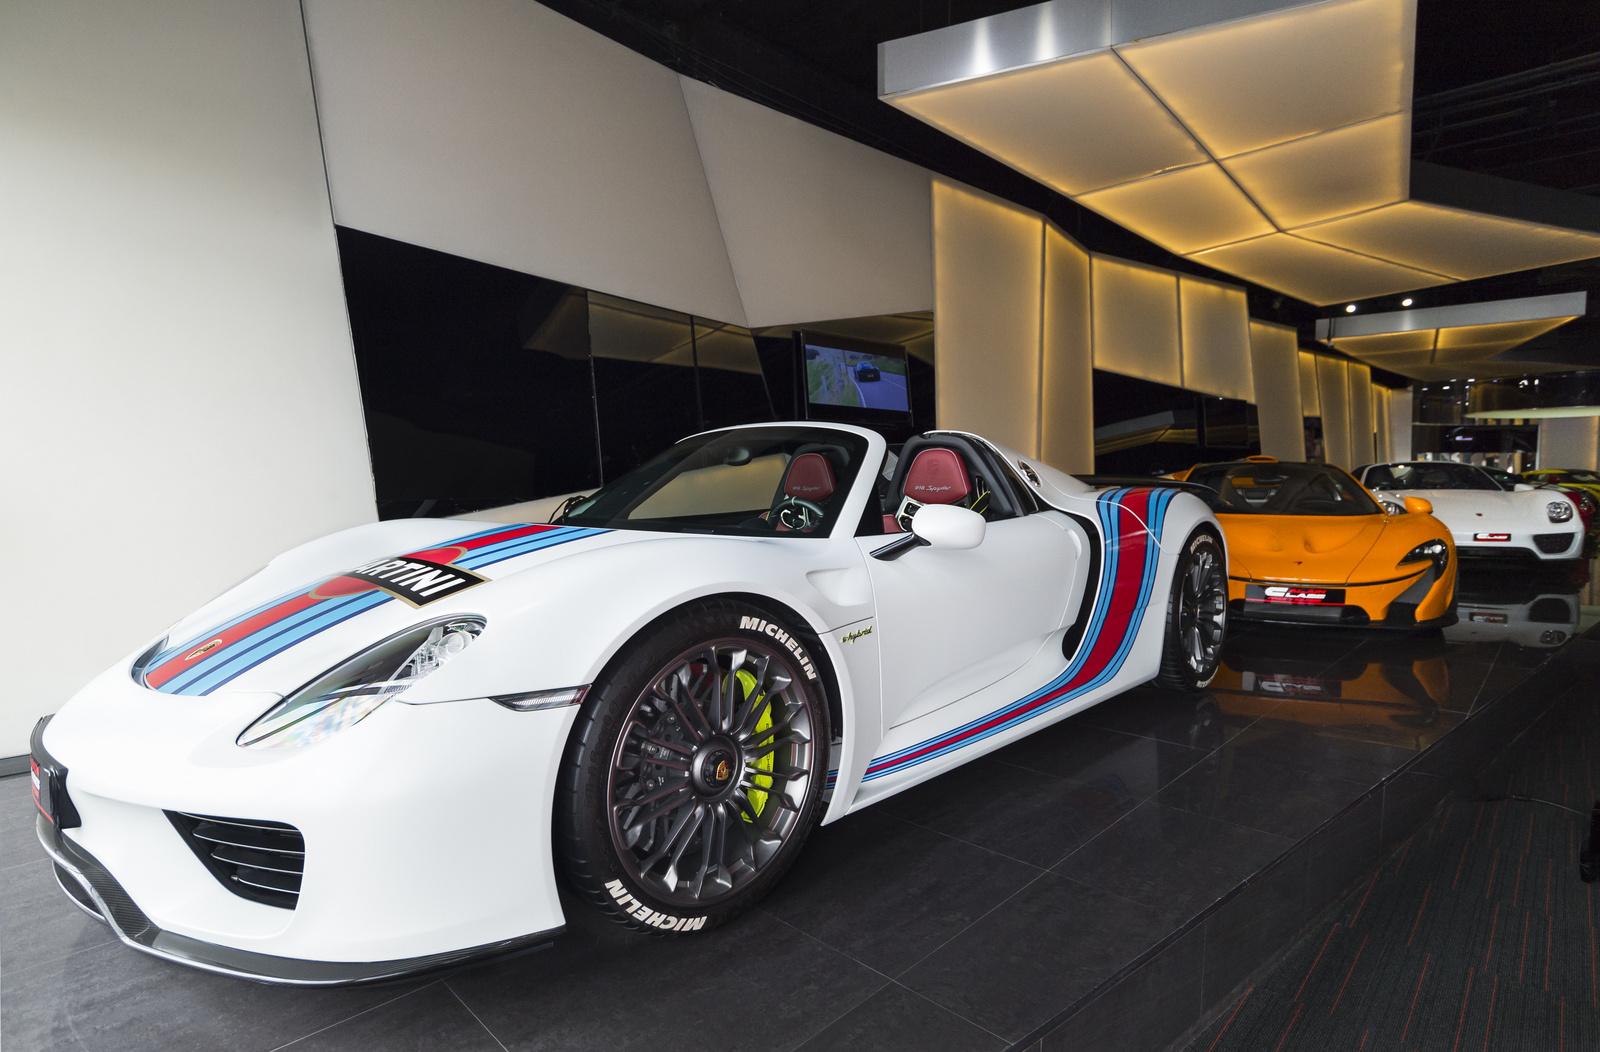 Porsche 918 Spyder - McLaren P1 - Porsche 918 Spyder